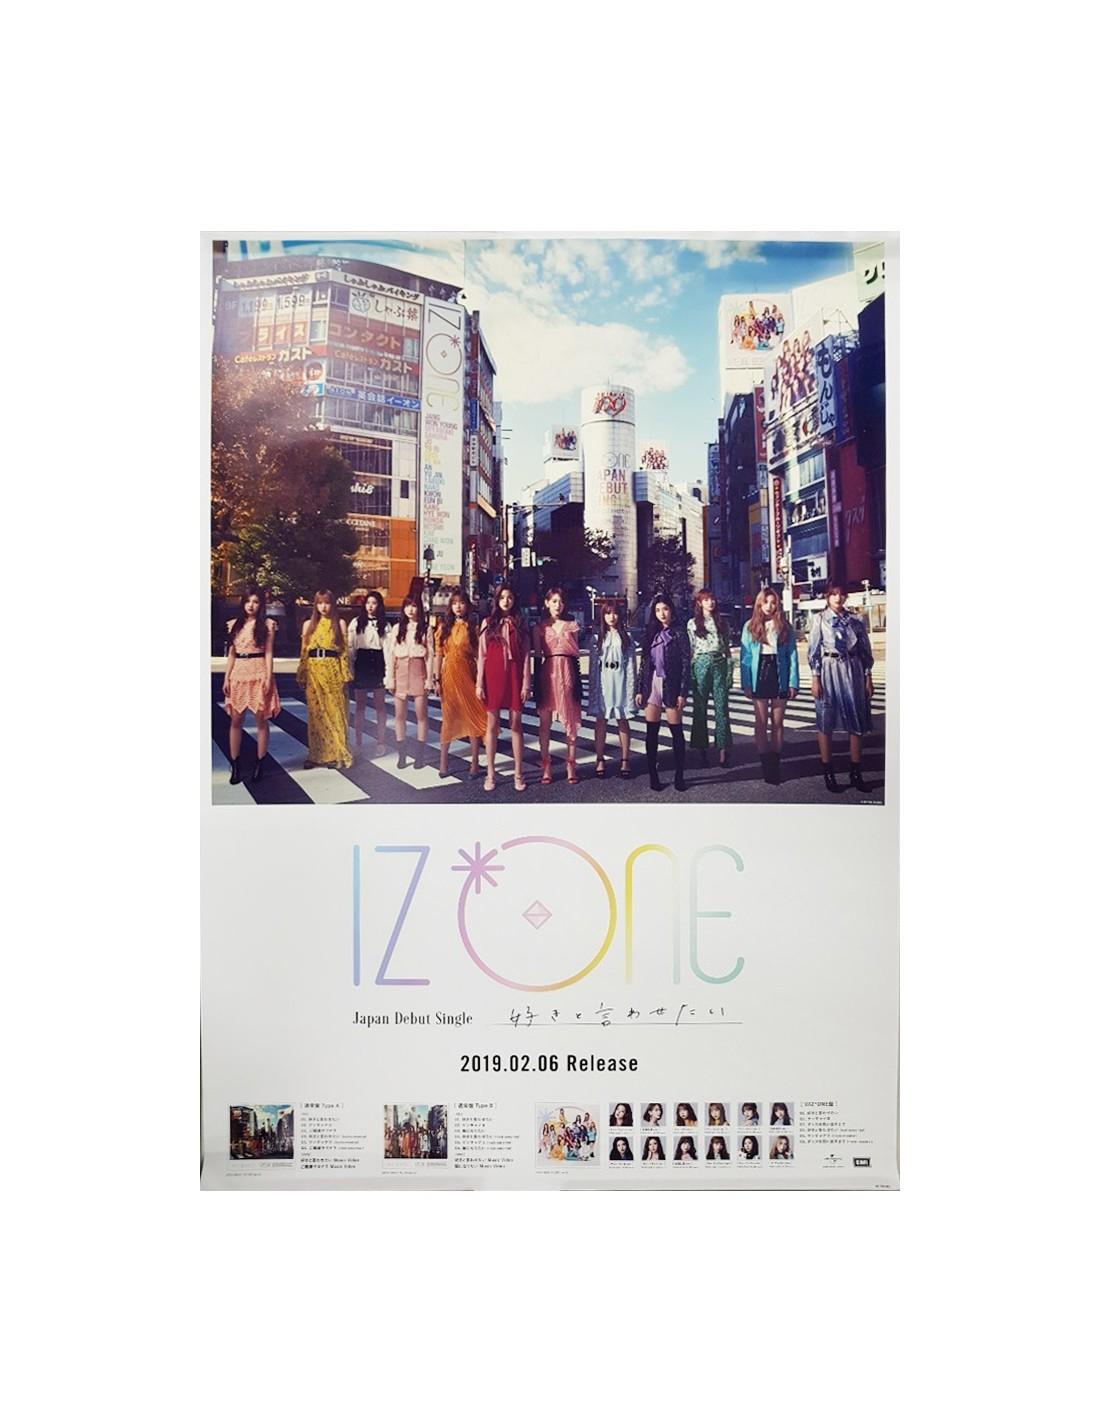 IZONE Japan debut on JumPic com